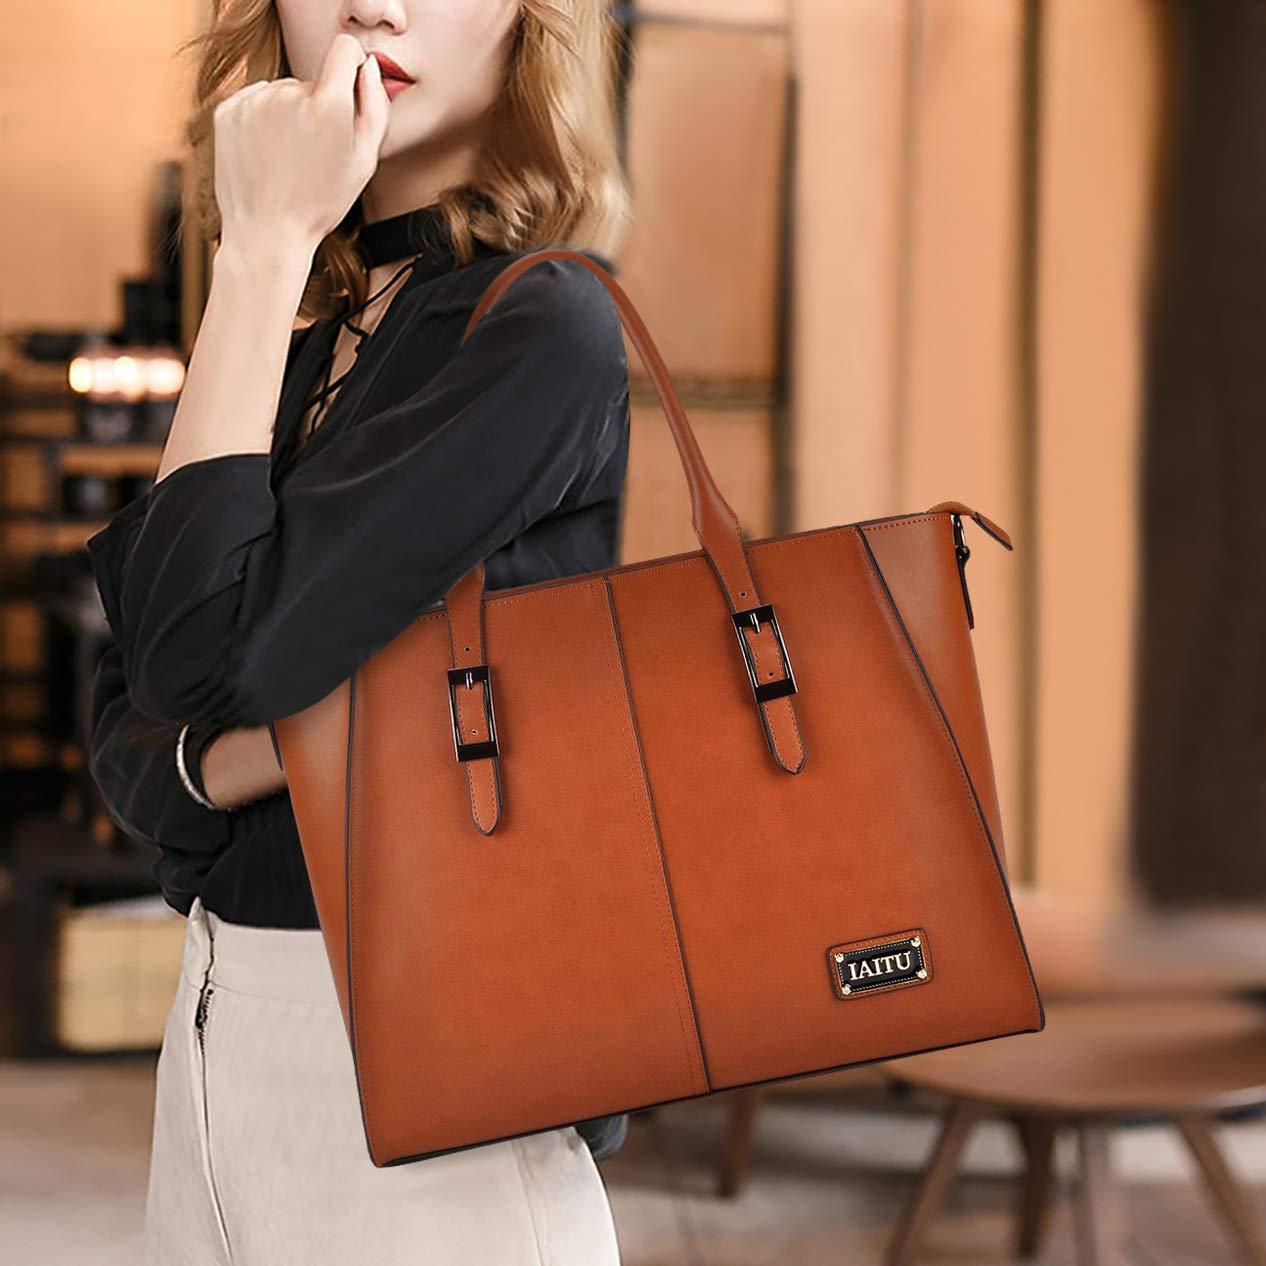 IAITU Laptop Tote Bag,15.6 Inch Crossbody Laptop Bag Casual Work Business Handbag with Smooth Zipper for Women(Brown) by IAITU (Image #1)